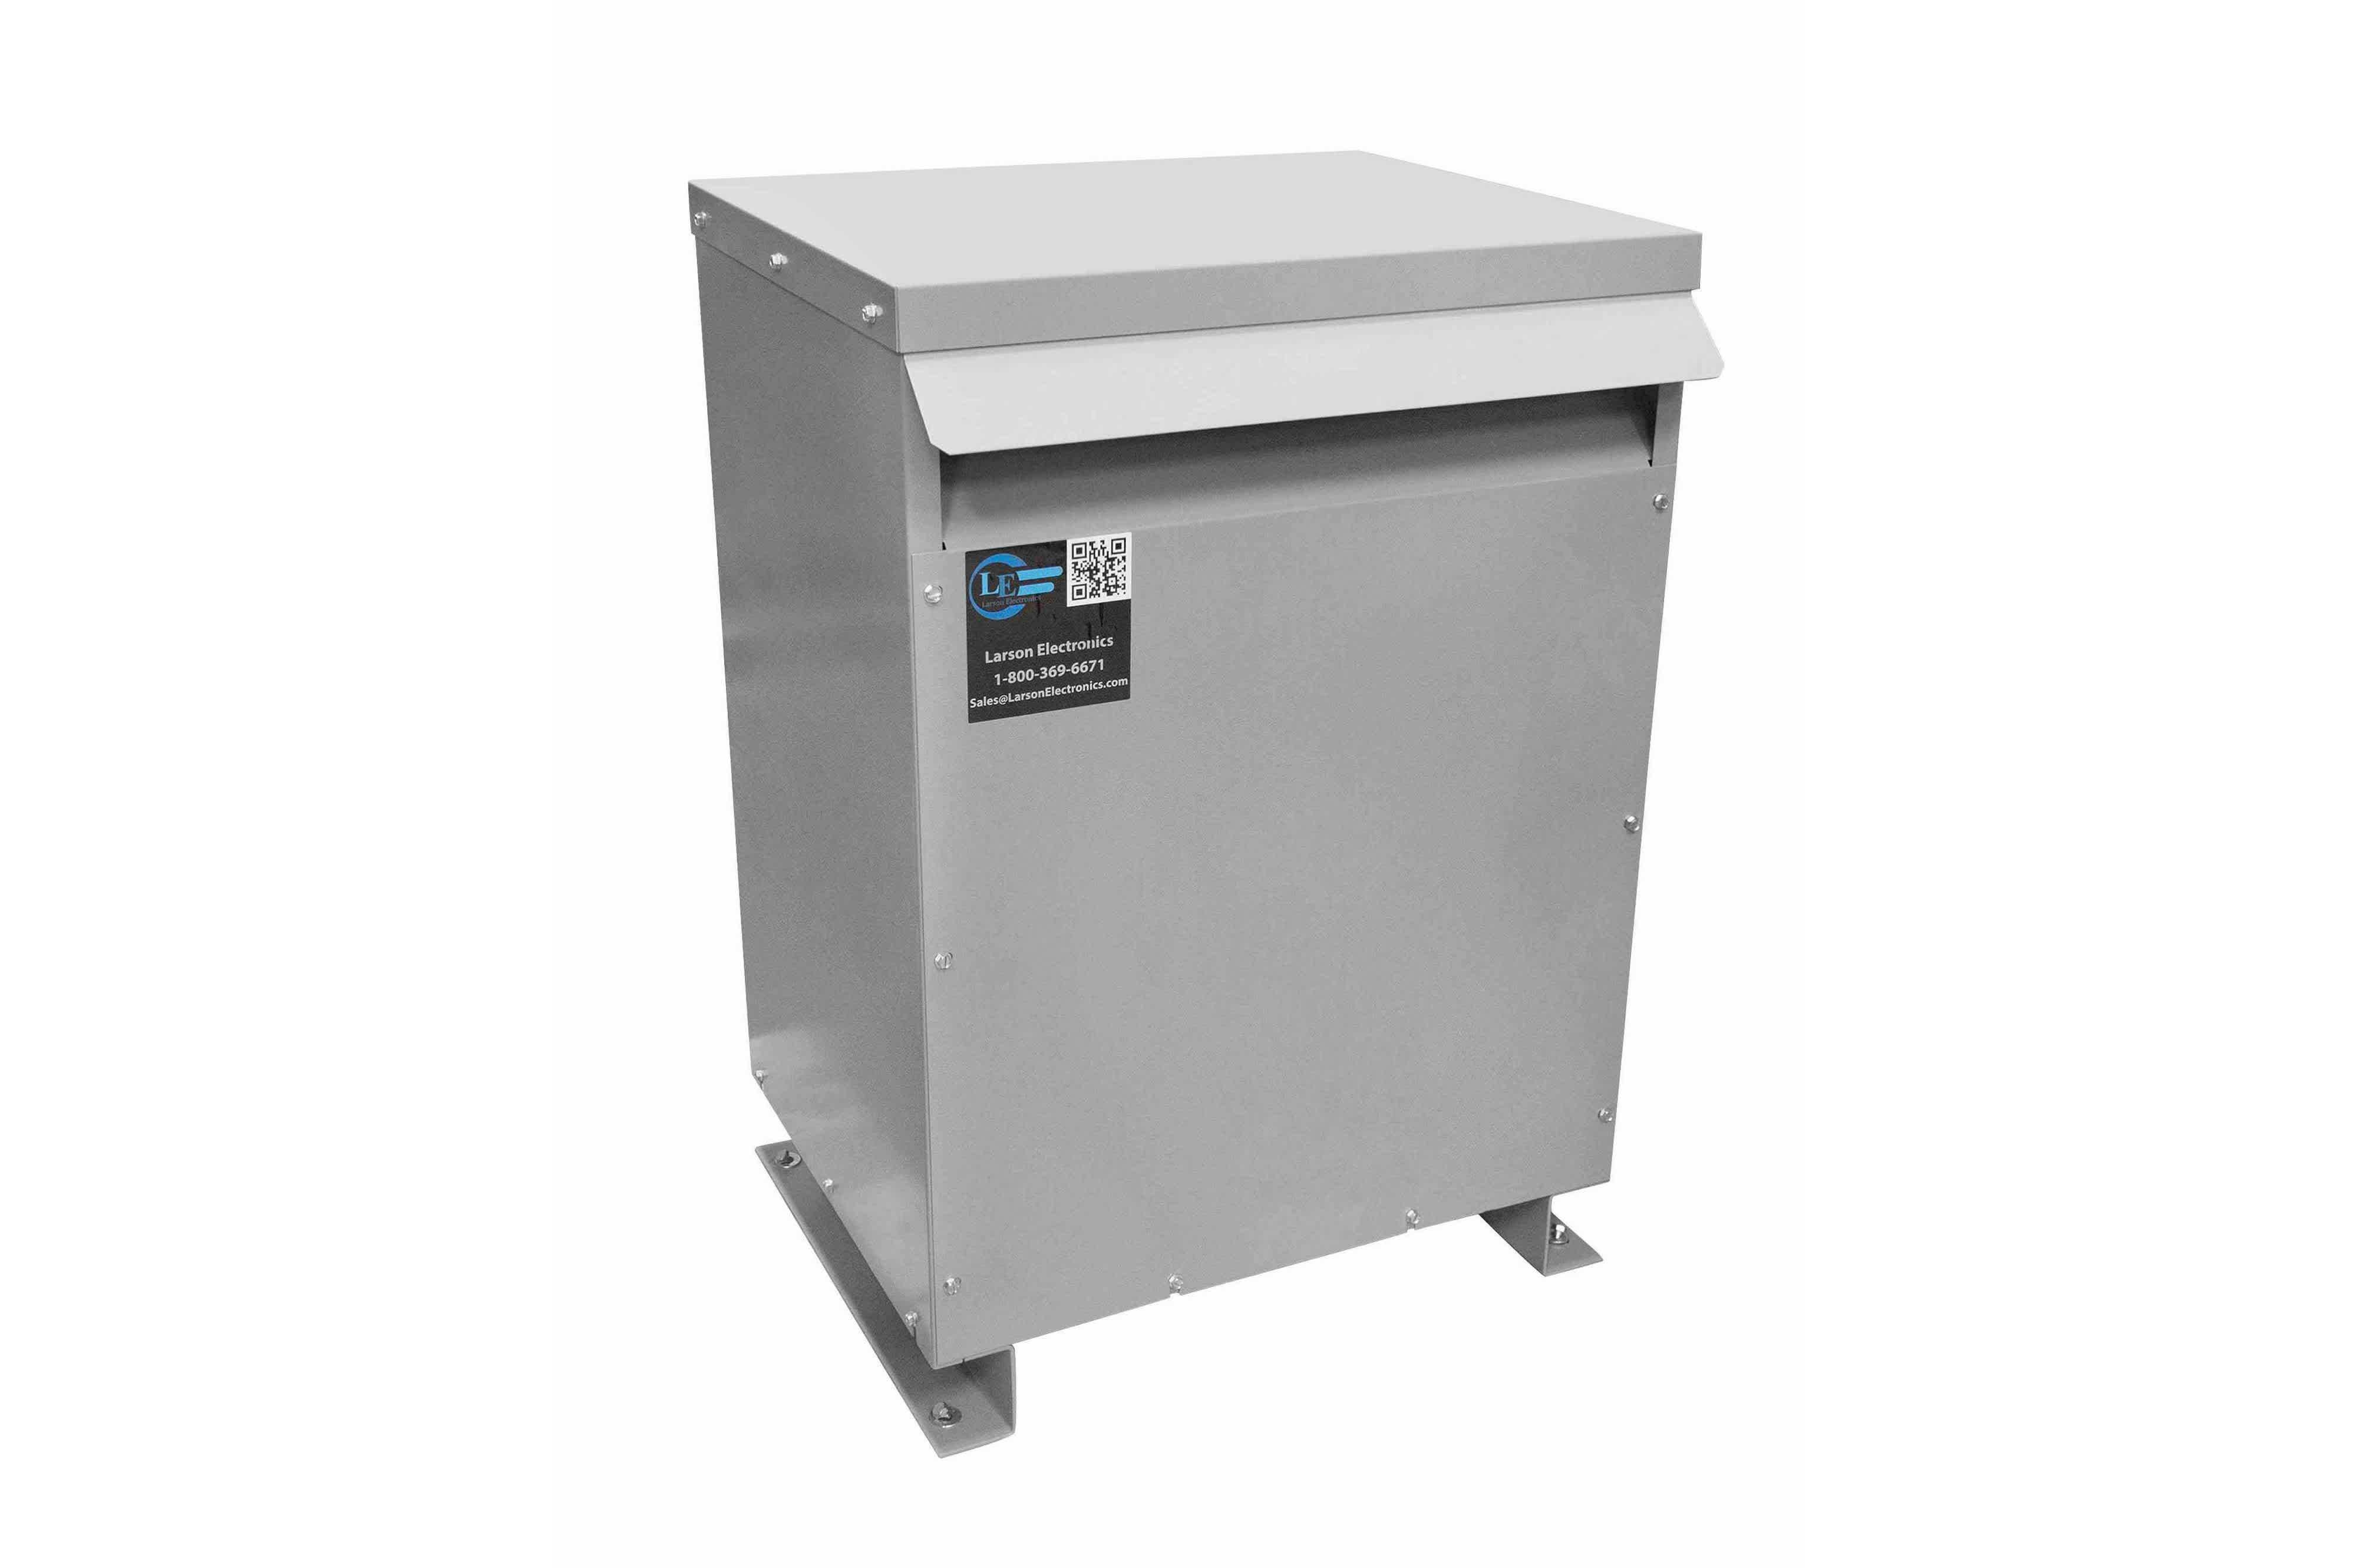 200 kVA 3PH Isolation Transformer, 240V Wye Primary, 208Y/120 Wye-N Secondary, N3R, Ventilated, 60 Hz